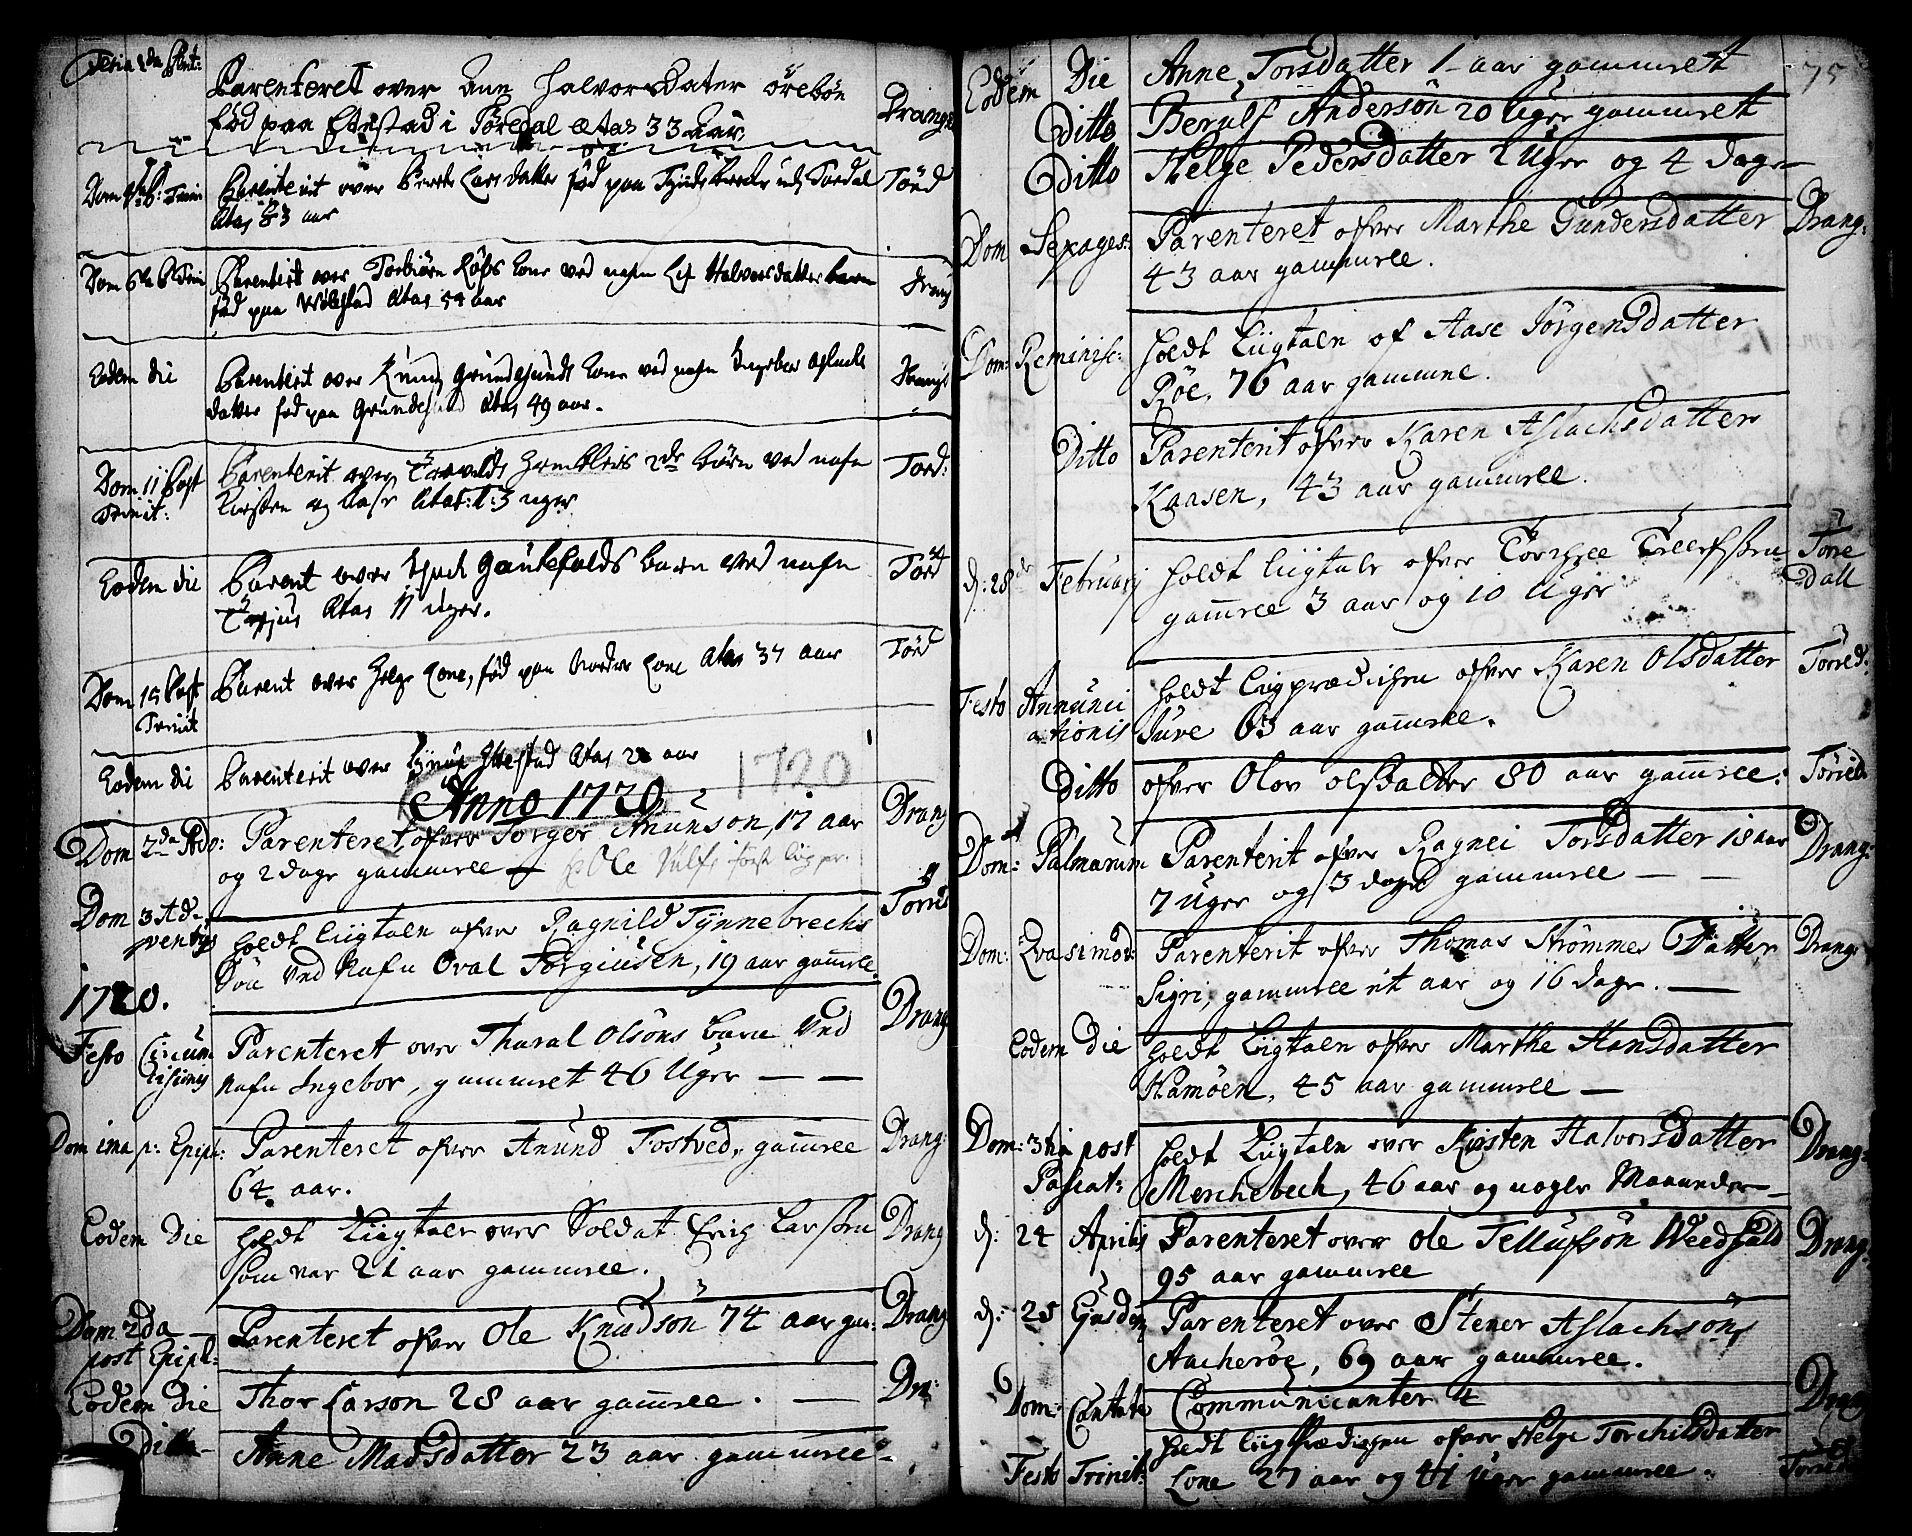 SAKO, Drangedal kirkebøker, F/Fa/L0001: Ministerialbok nr. 1, 1697-1767, s. 75